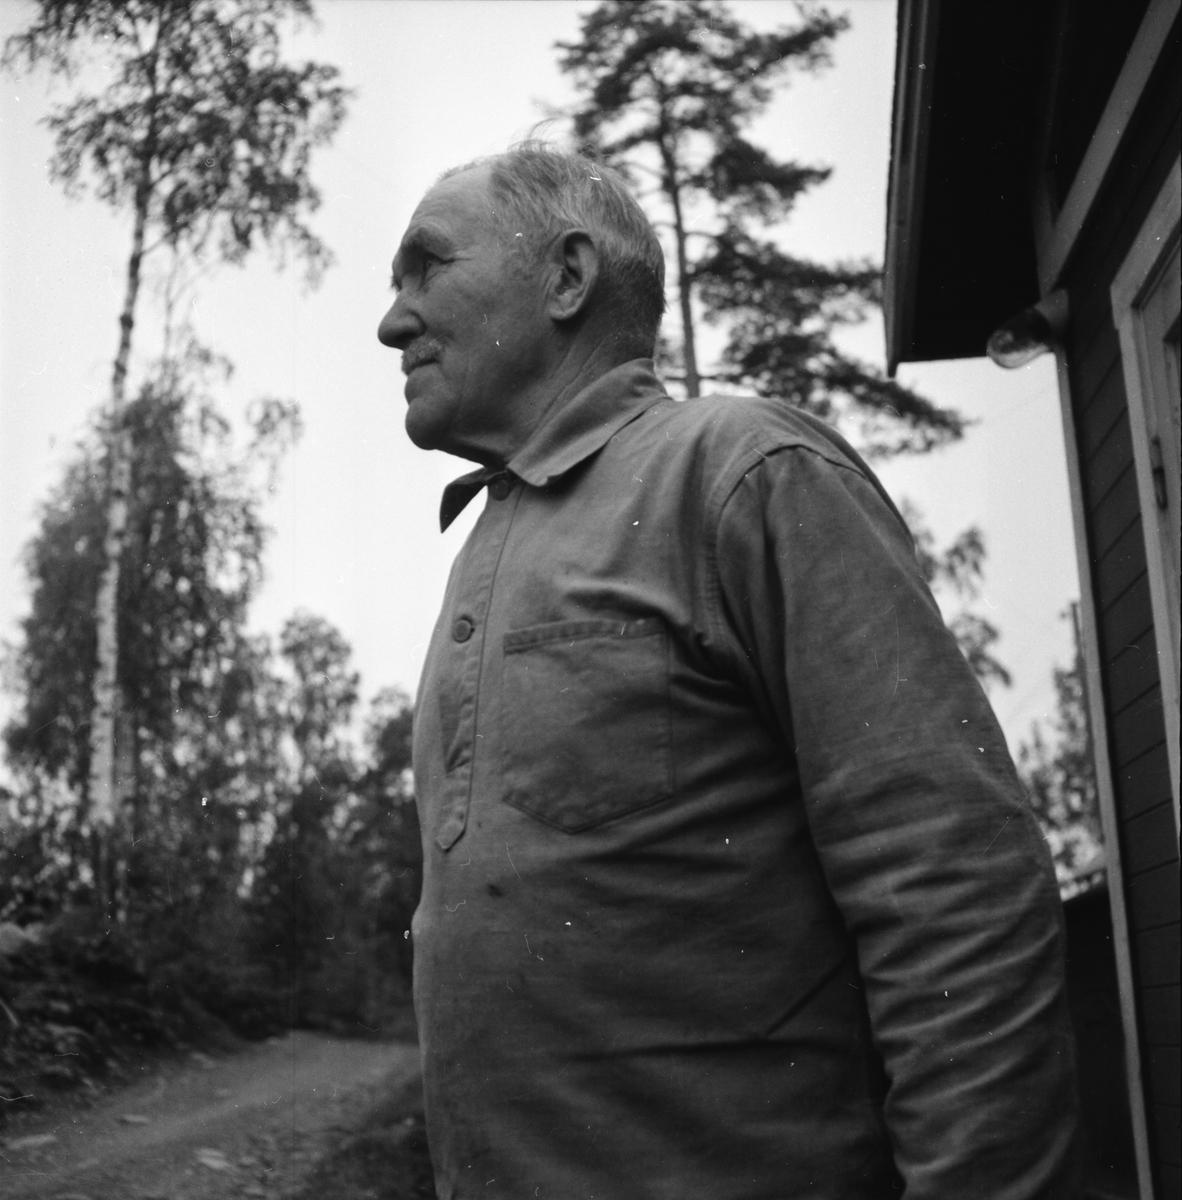 Alfta Kompani, minnessten, Knektar Frisk Erik, Nord Johan, Borg Johan